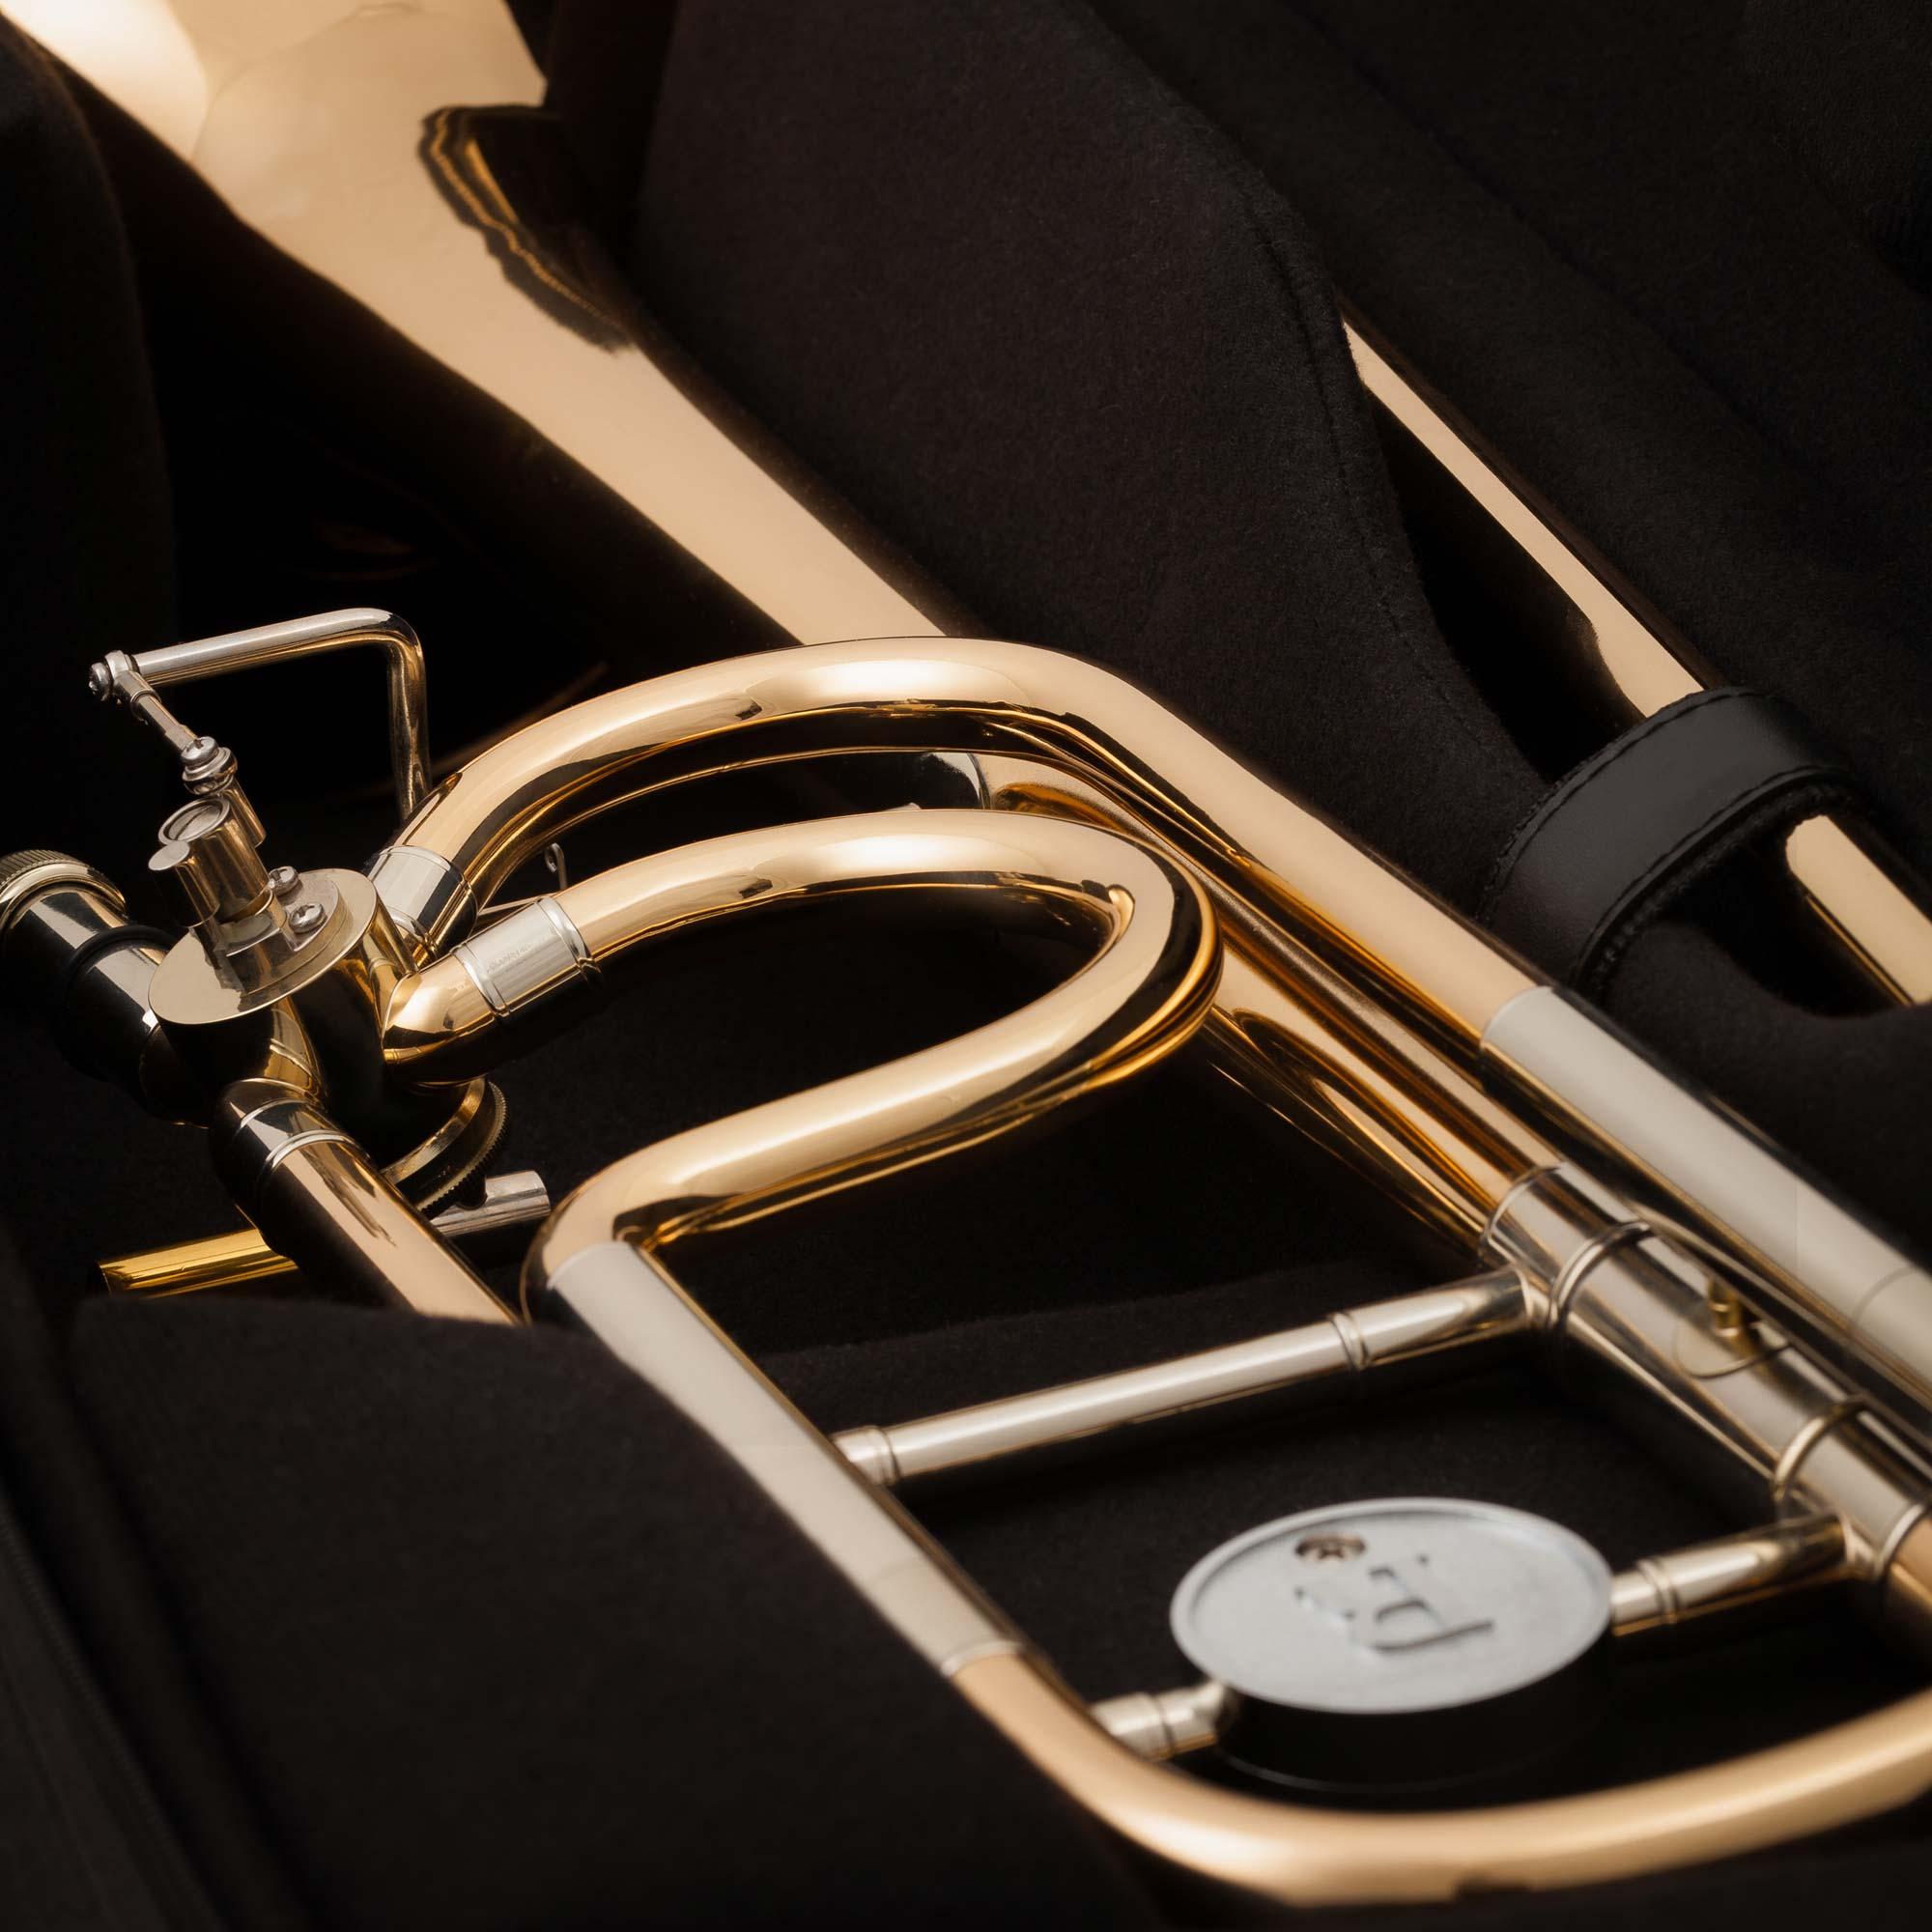 JP-Universal-Lightweight-trombone-case-MACRO-SHOT-2